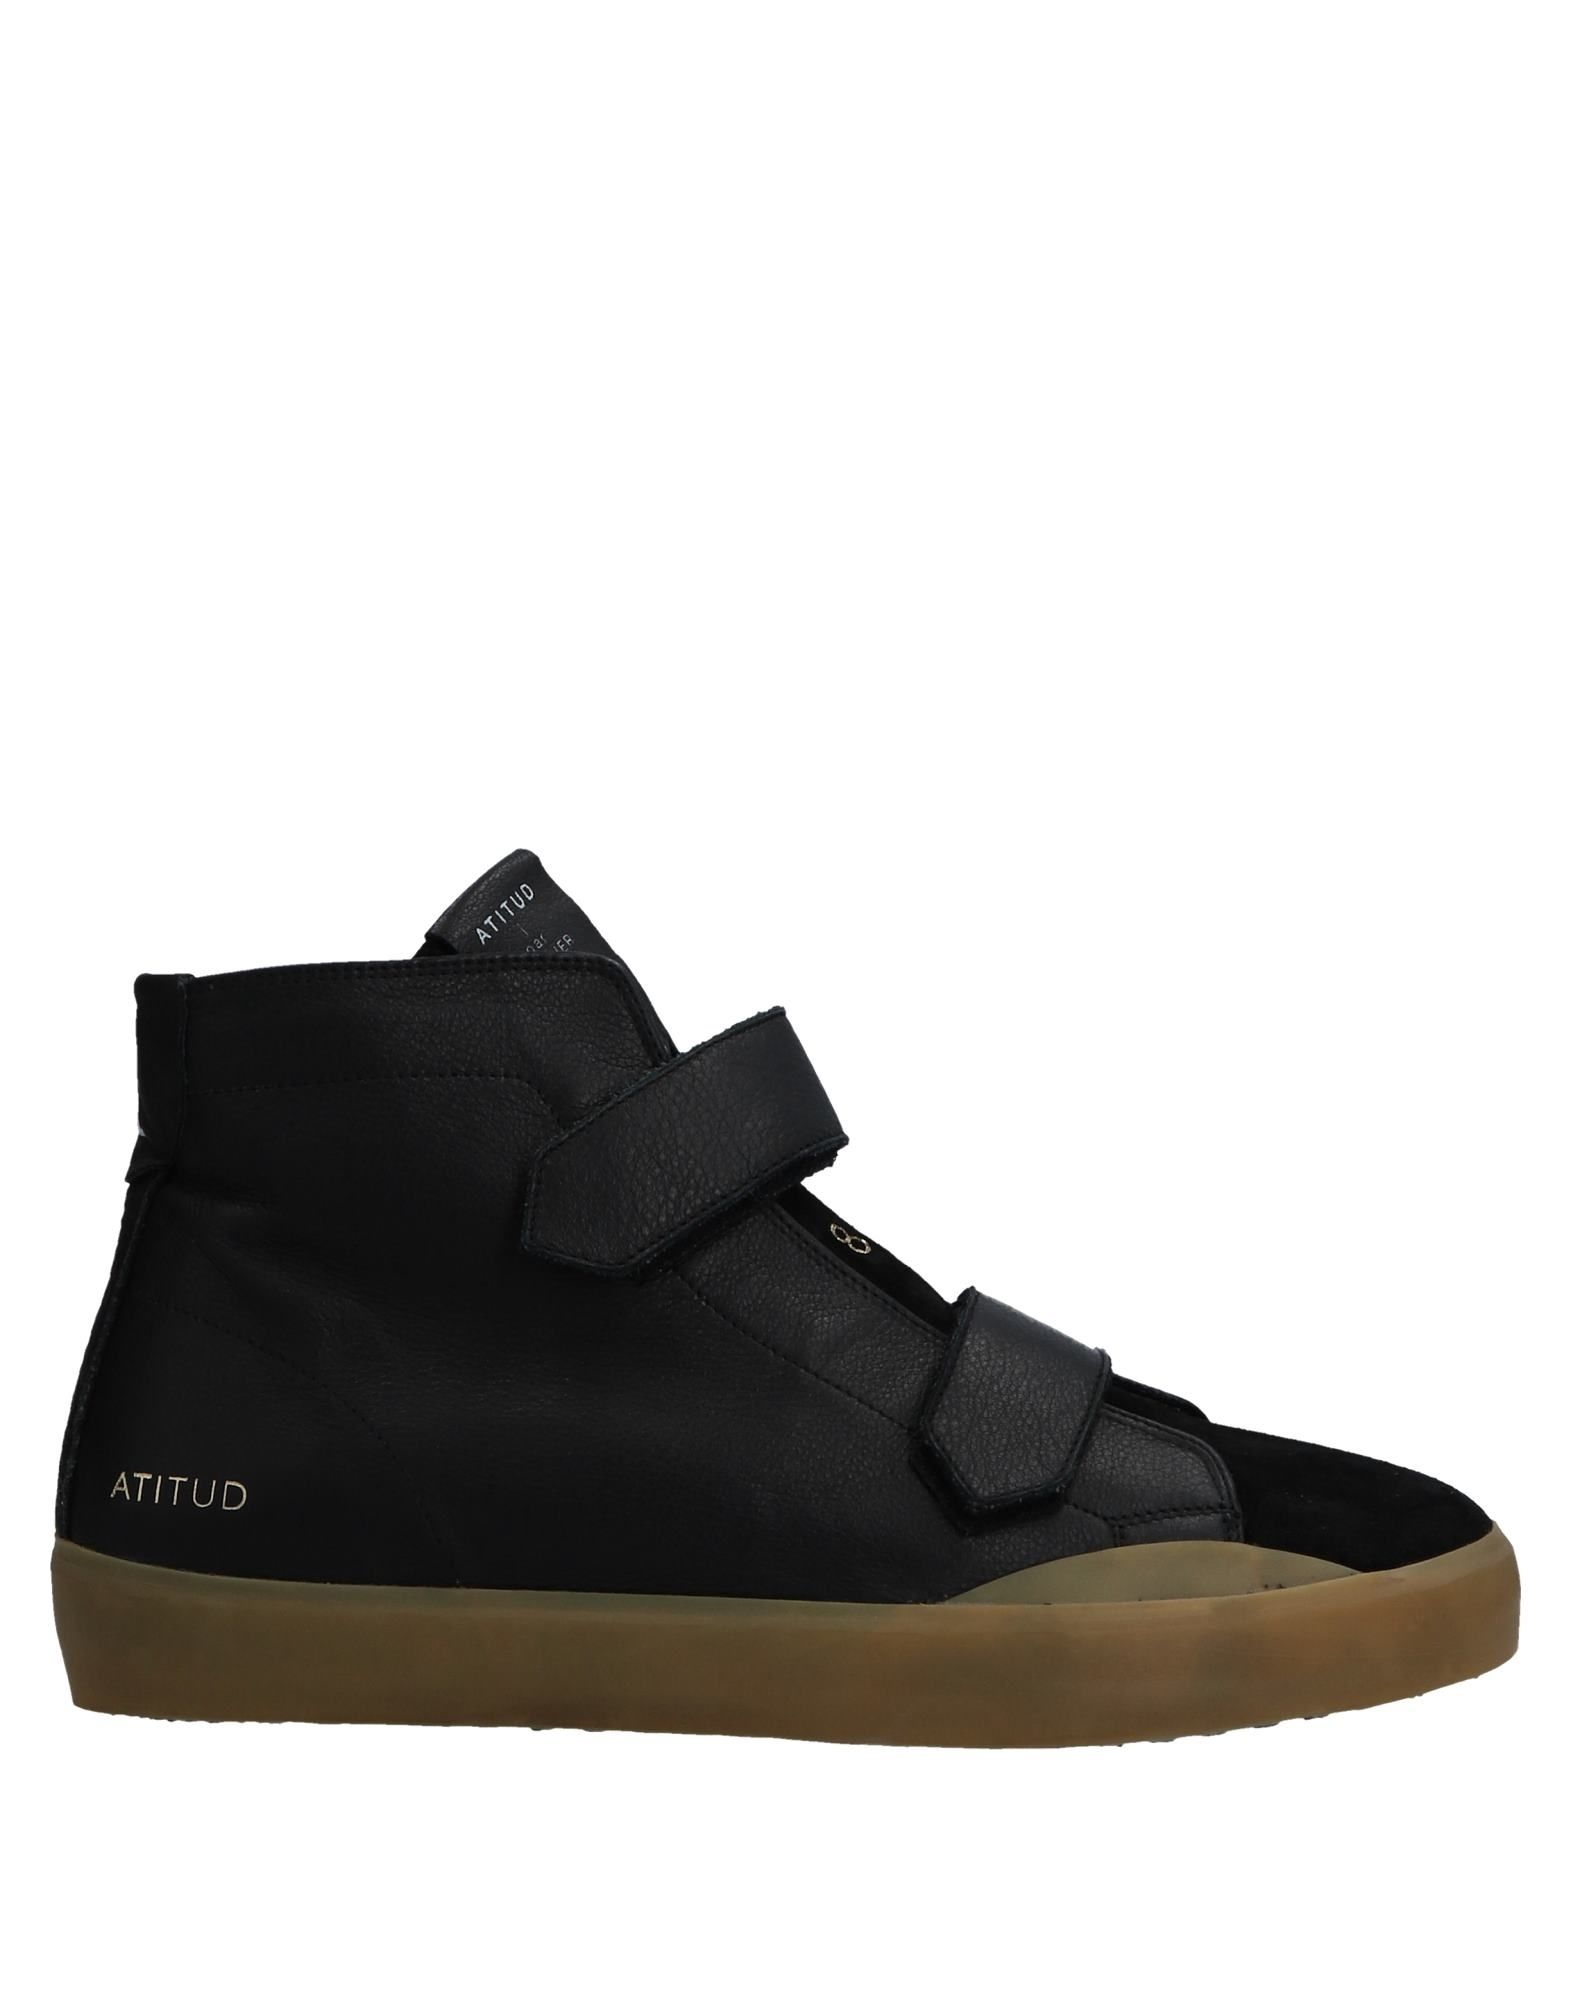 Leather Crown Sneakers Herren  11531753MN Gute Qualität beliebte Schuhe